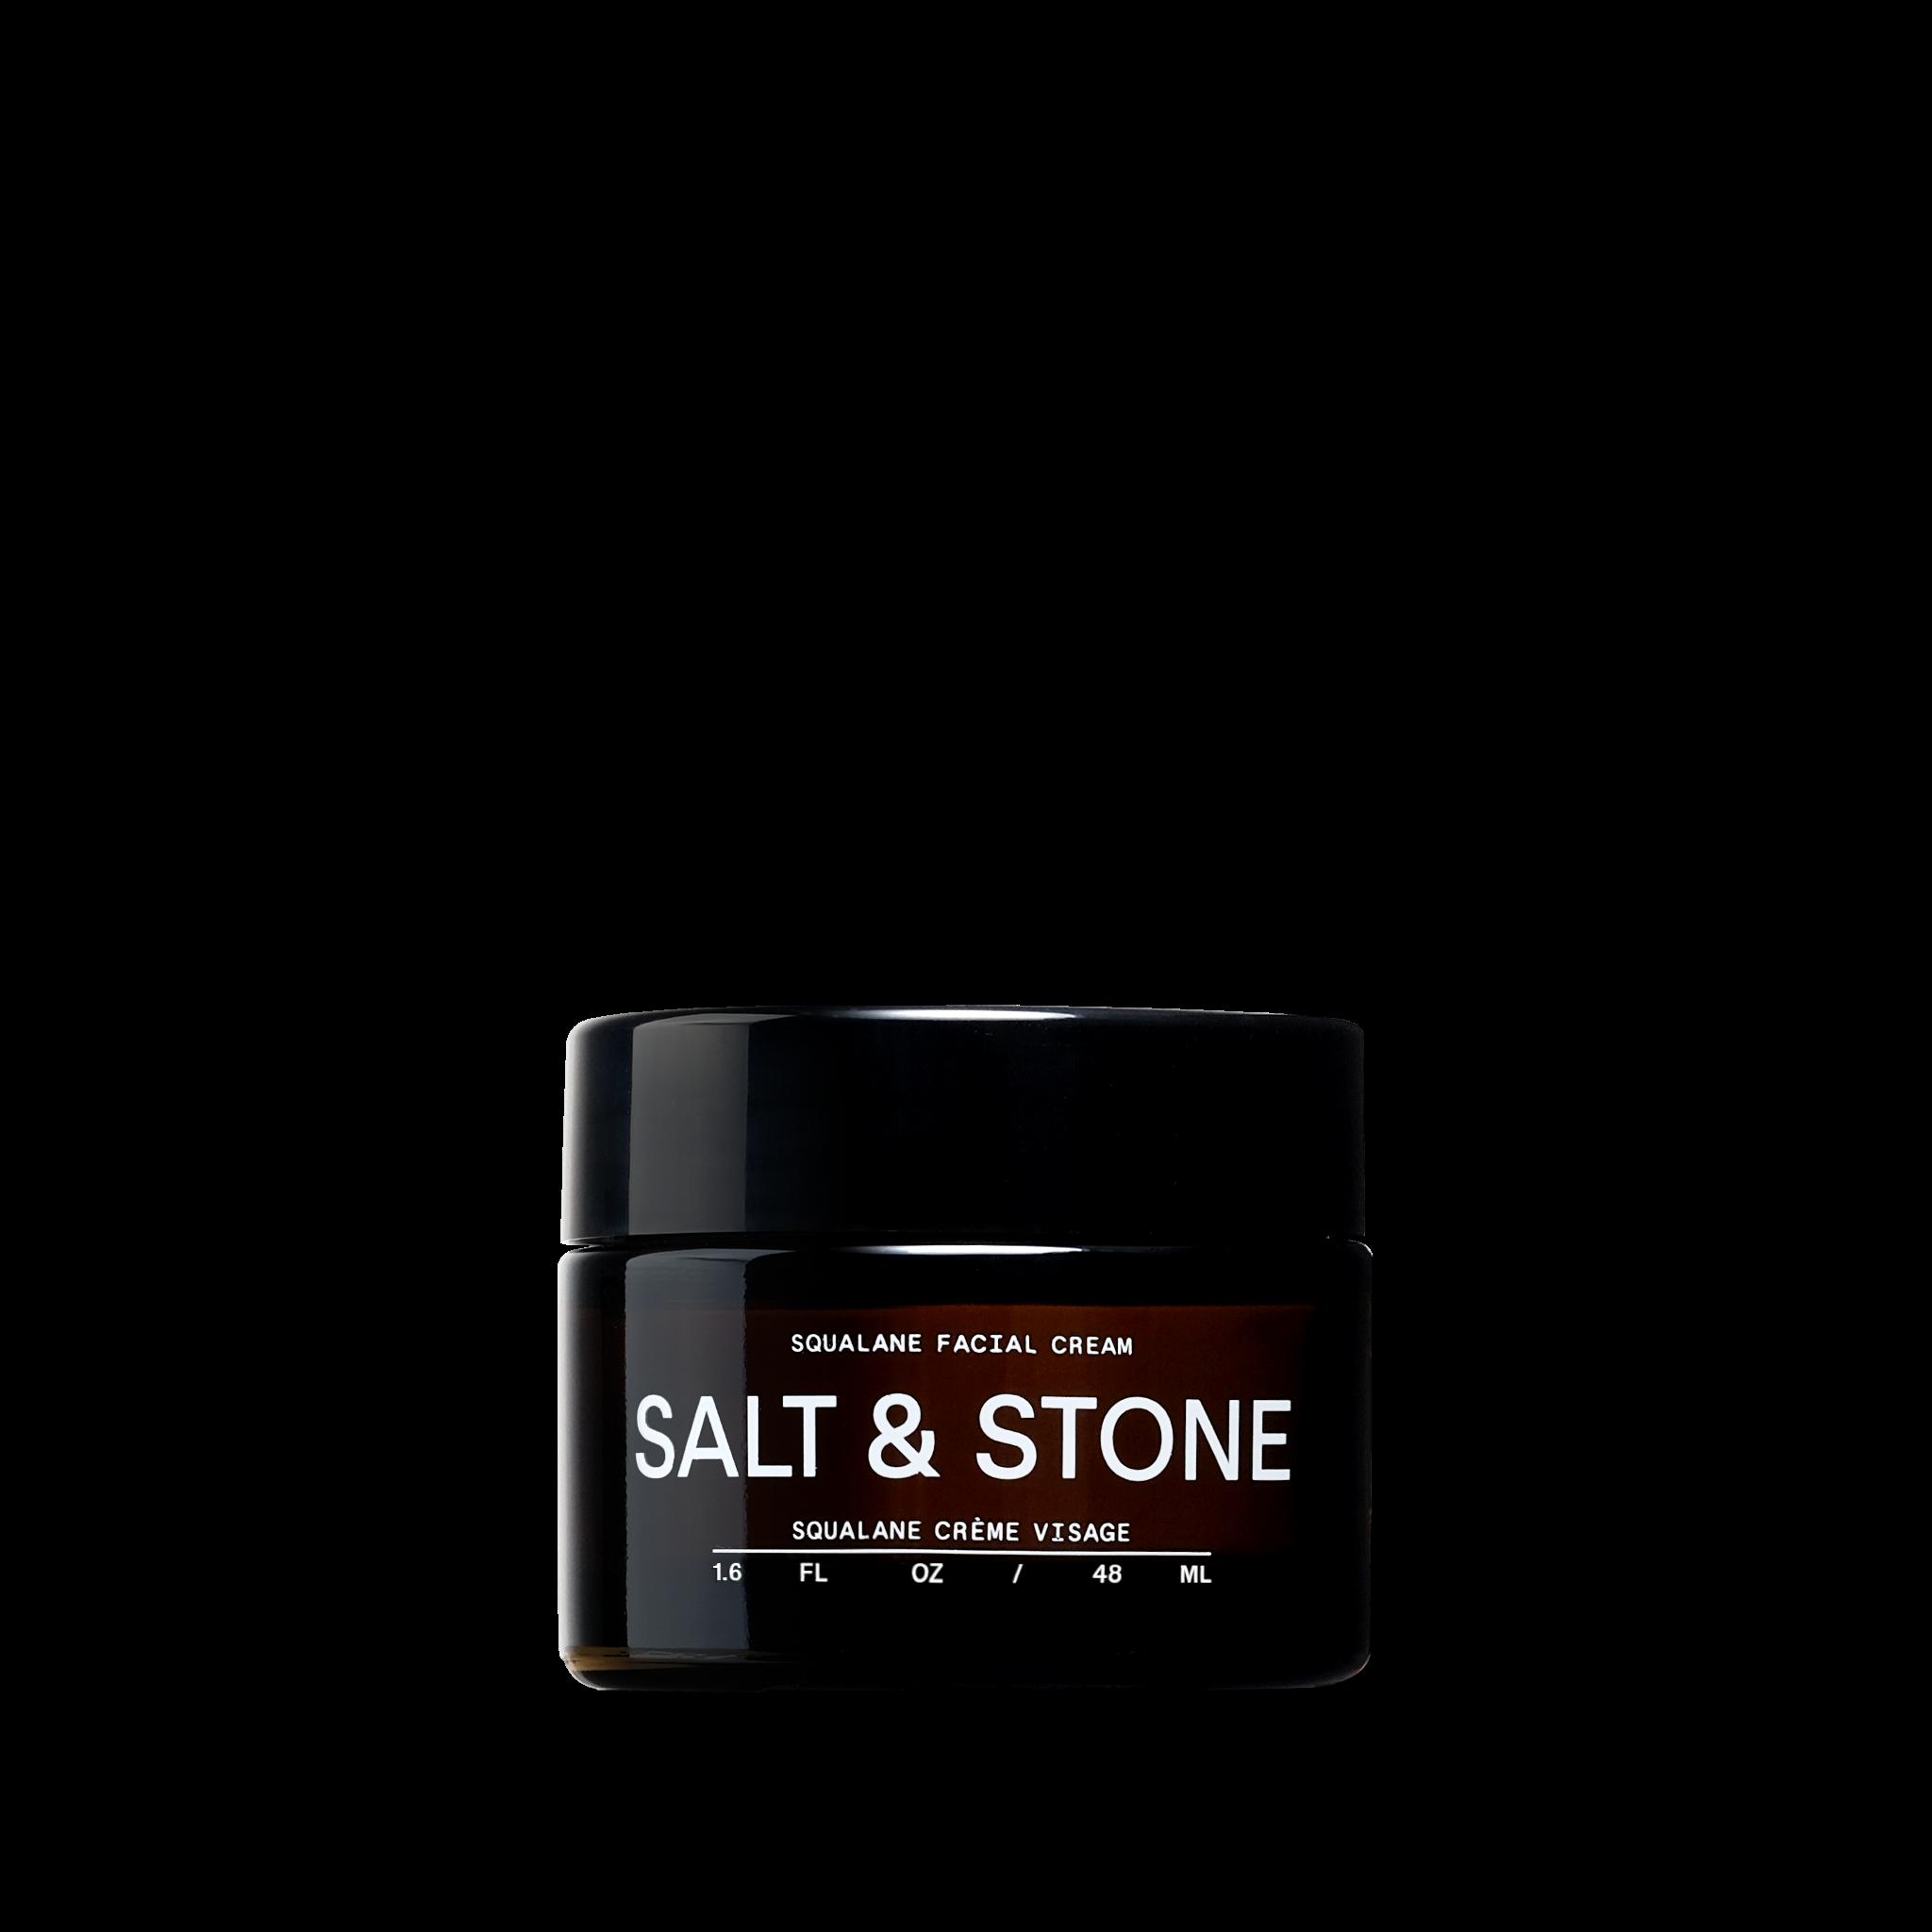 Salt & Stone Salt&Stone - Squalane Facial Cream